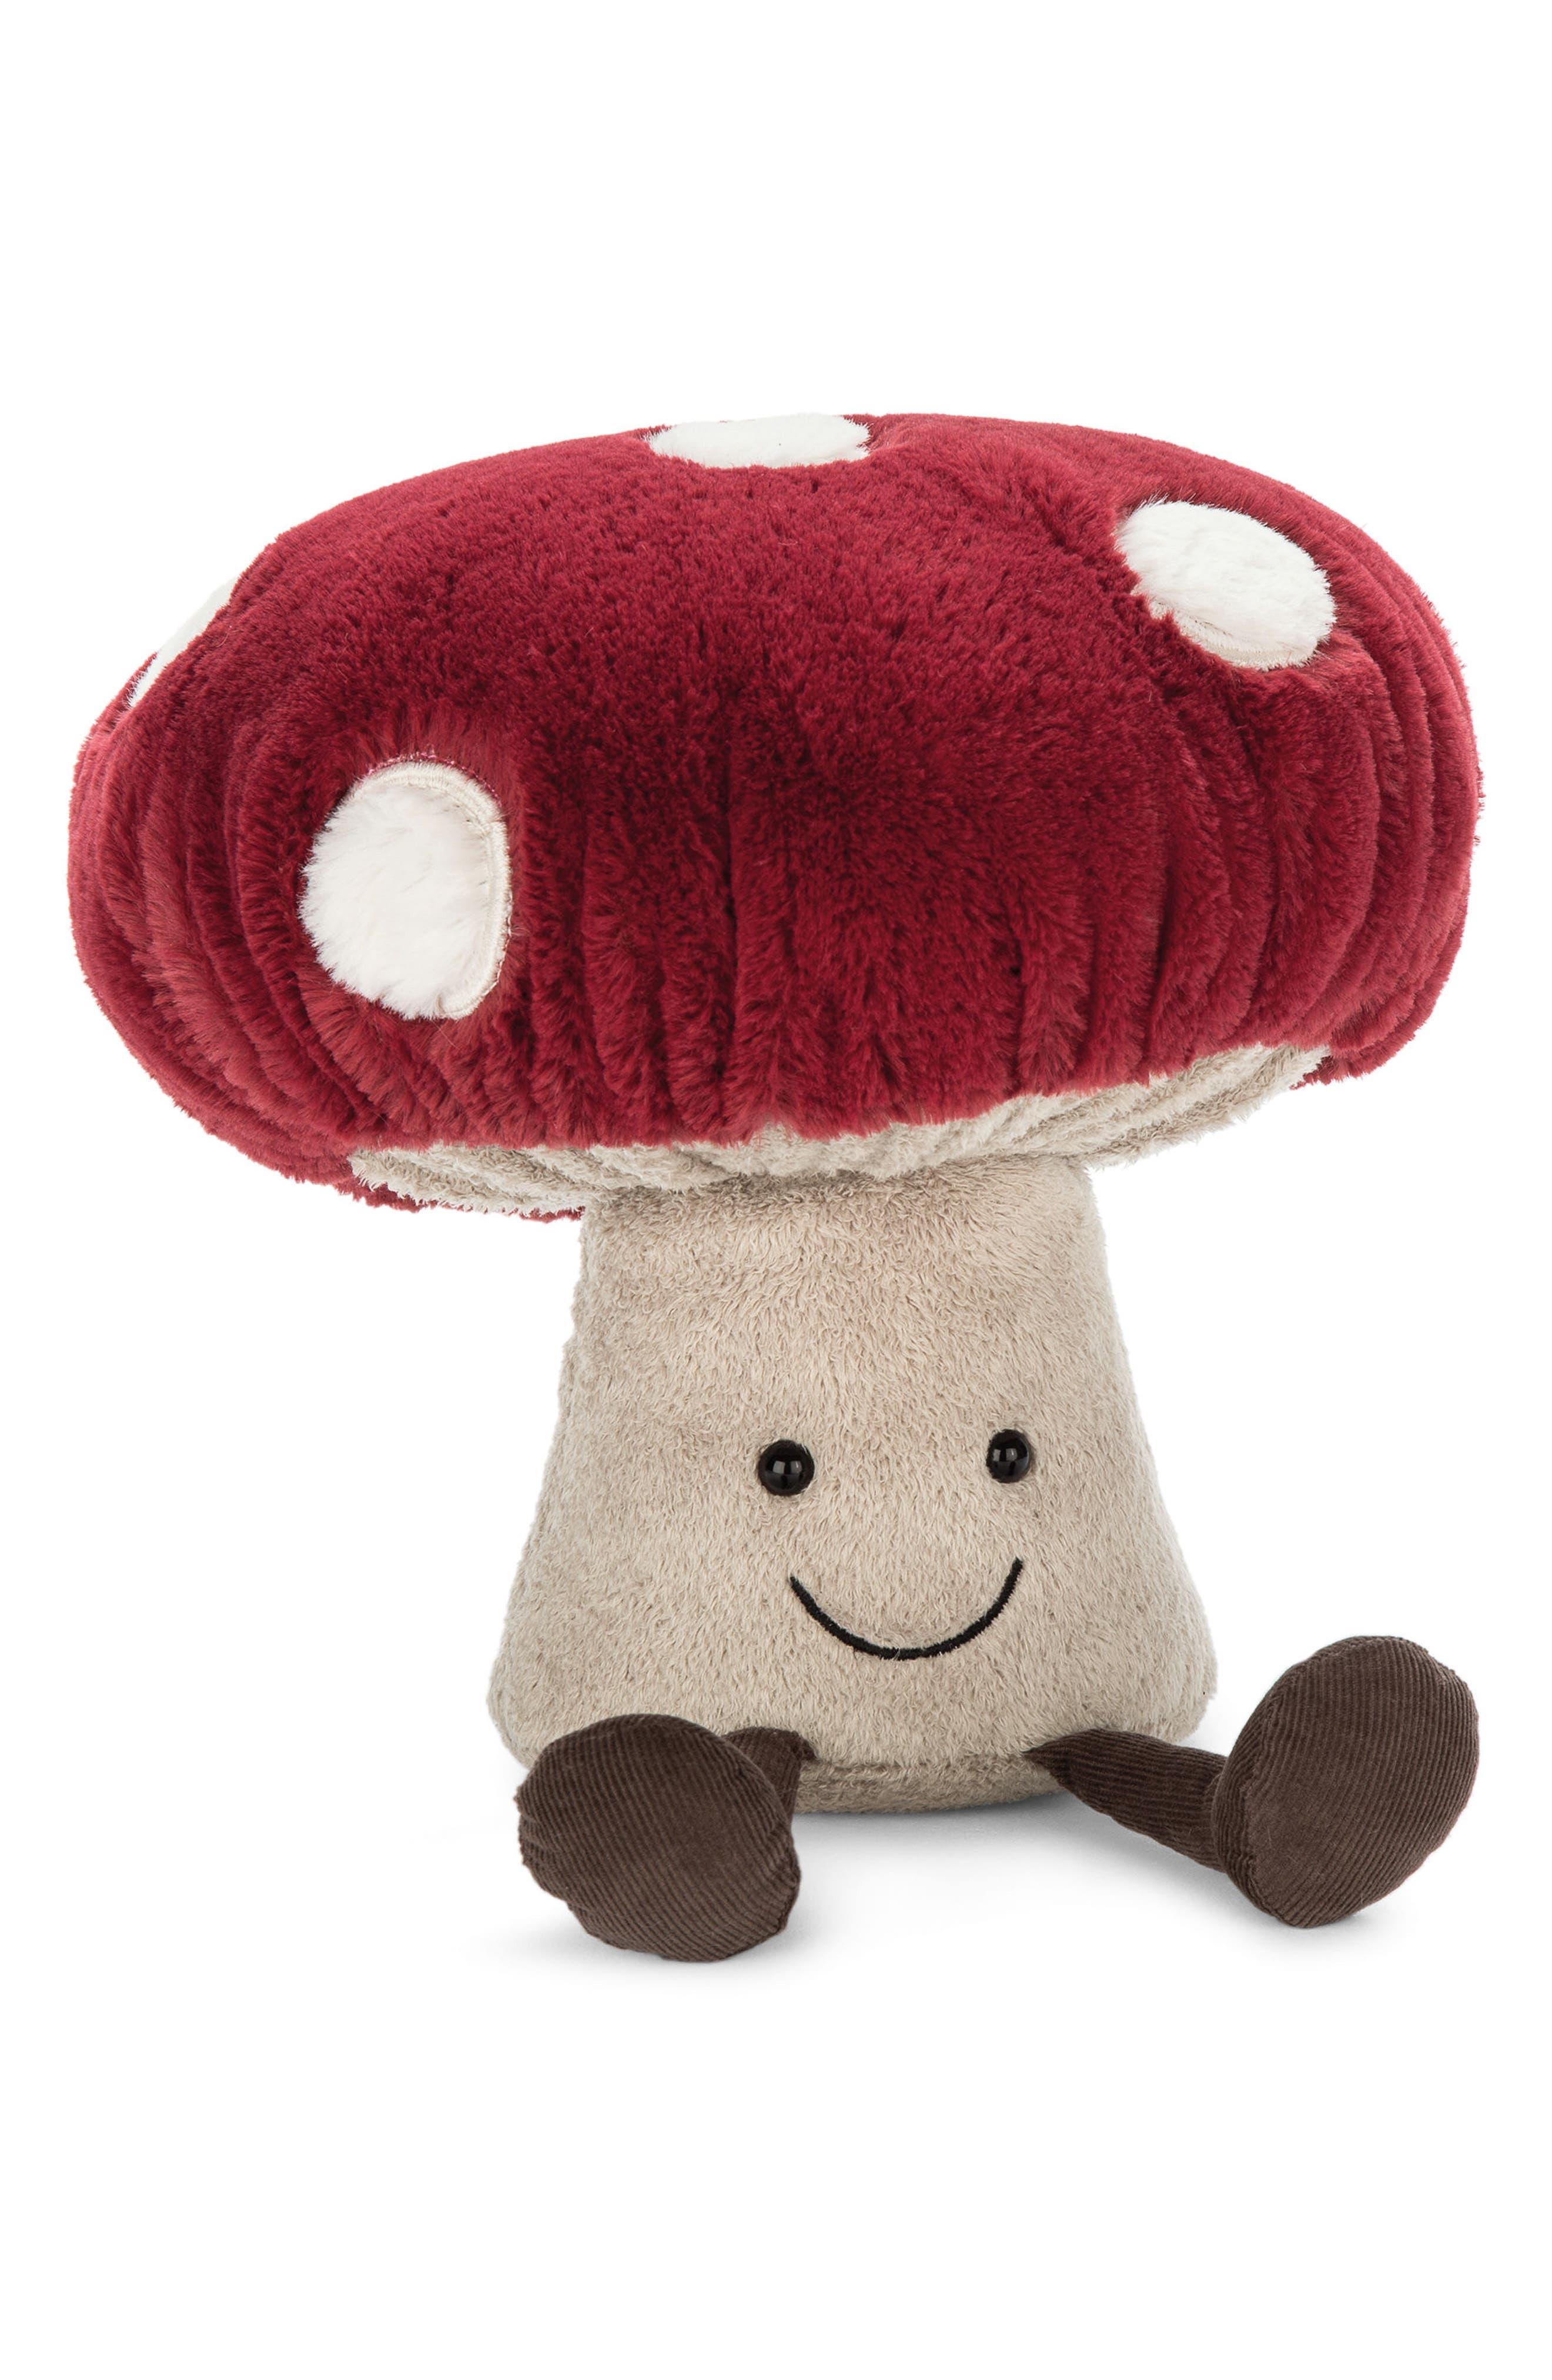 Amuseable Mushroom Plush Toy,                         Main,                         color, 600